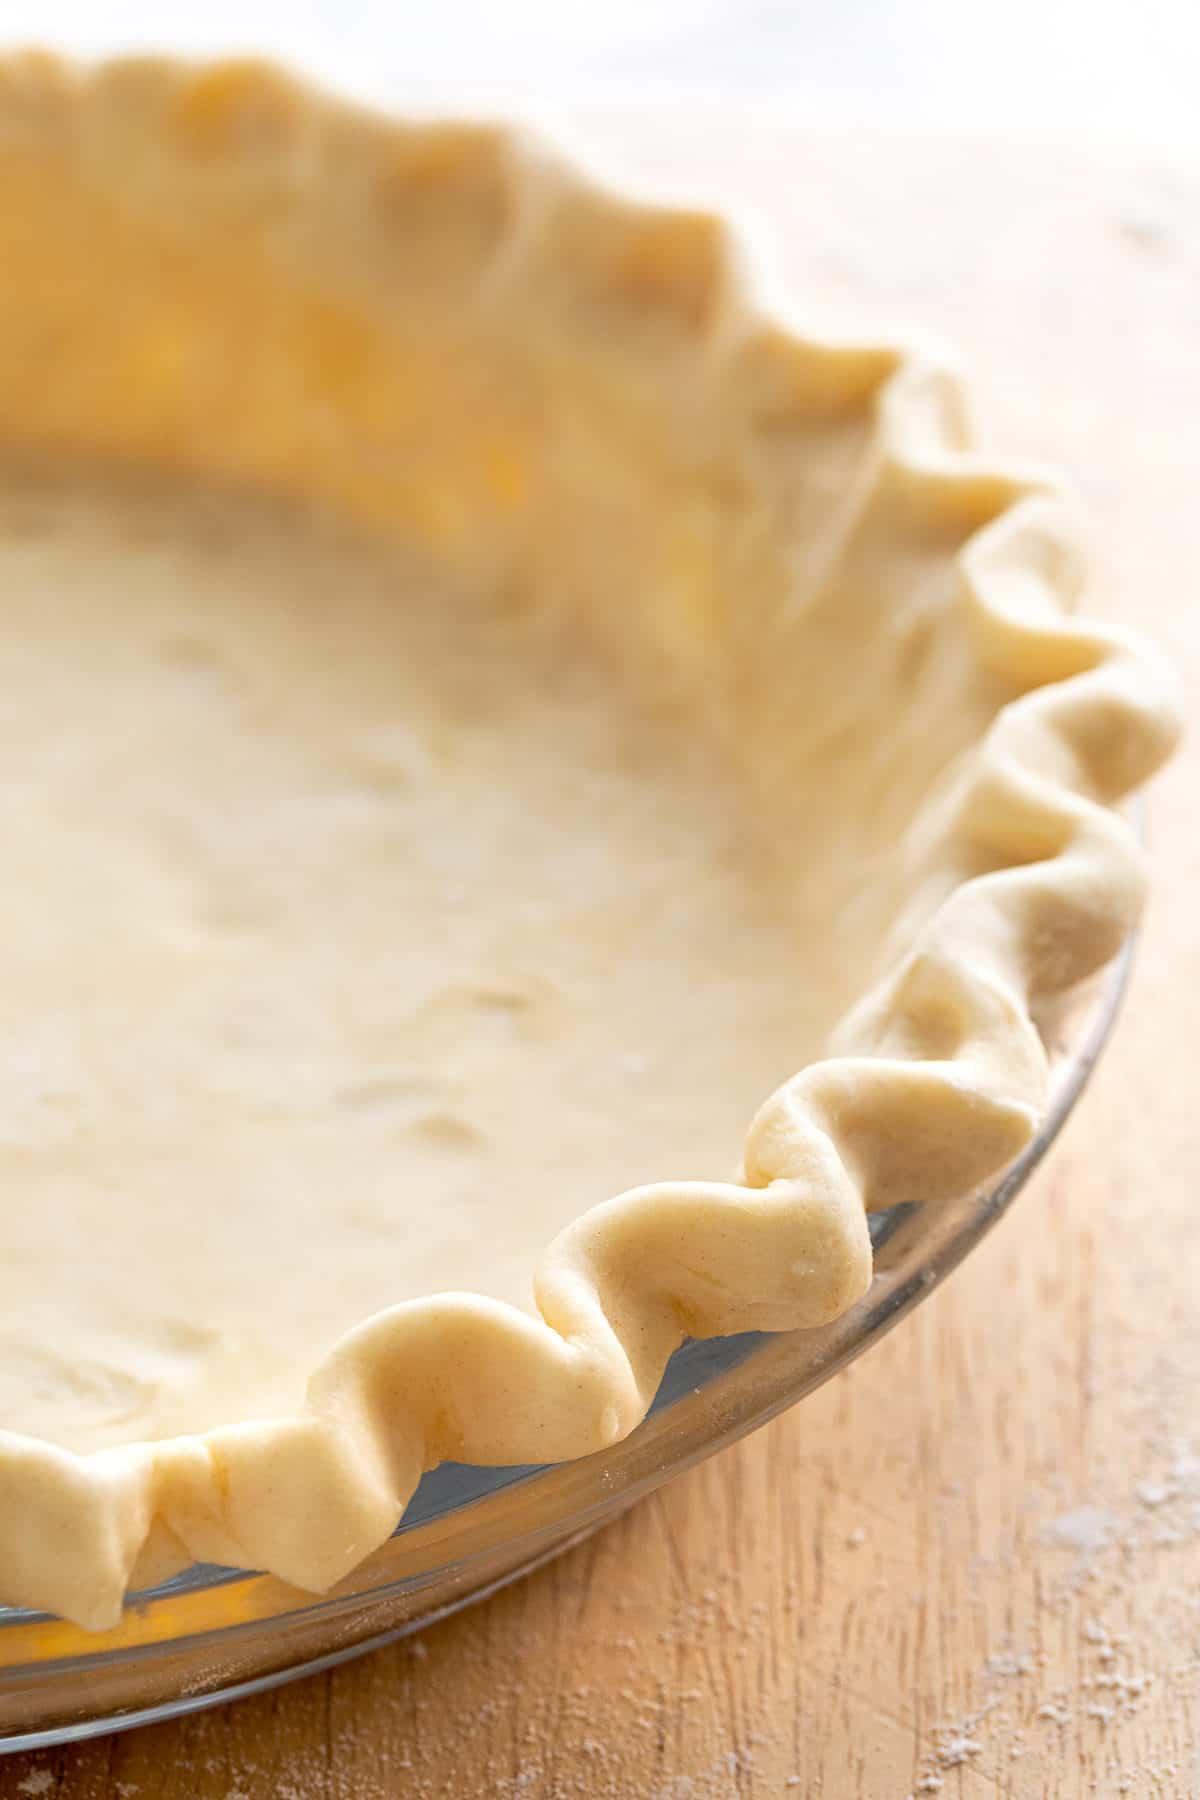 pie crust with crimped edges